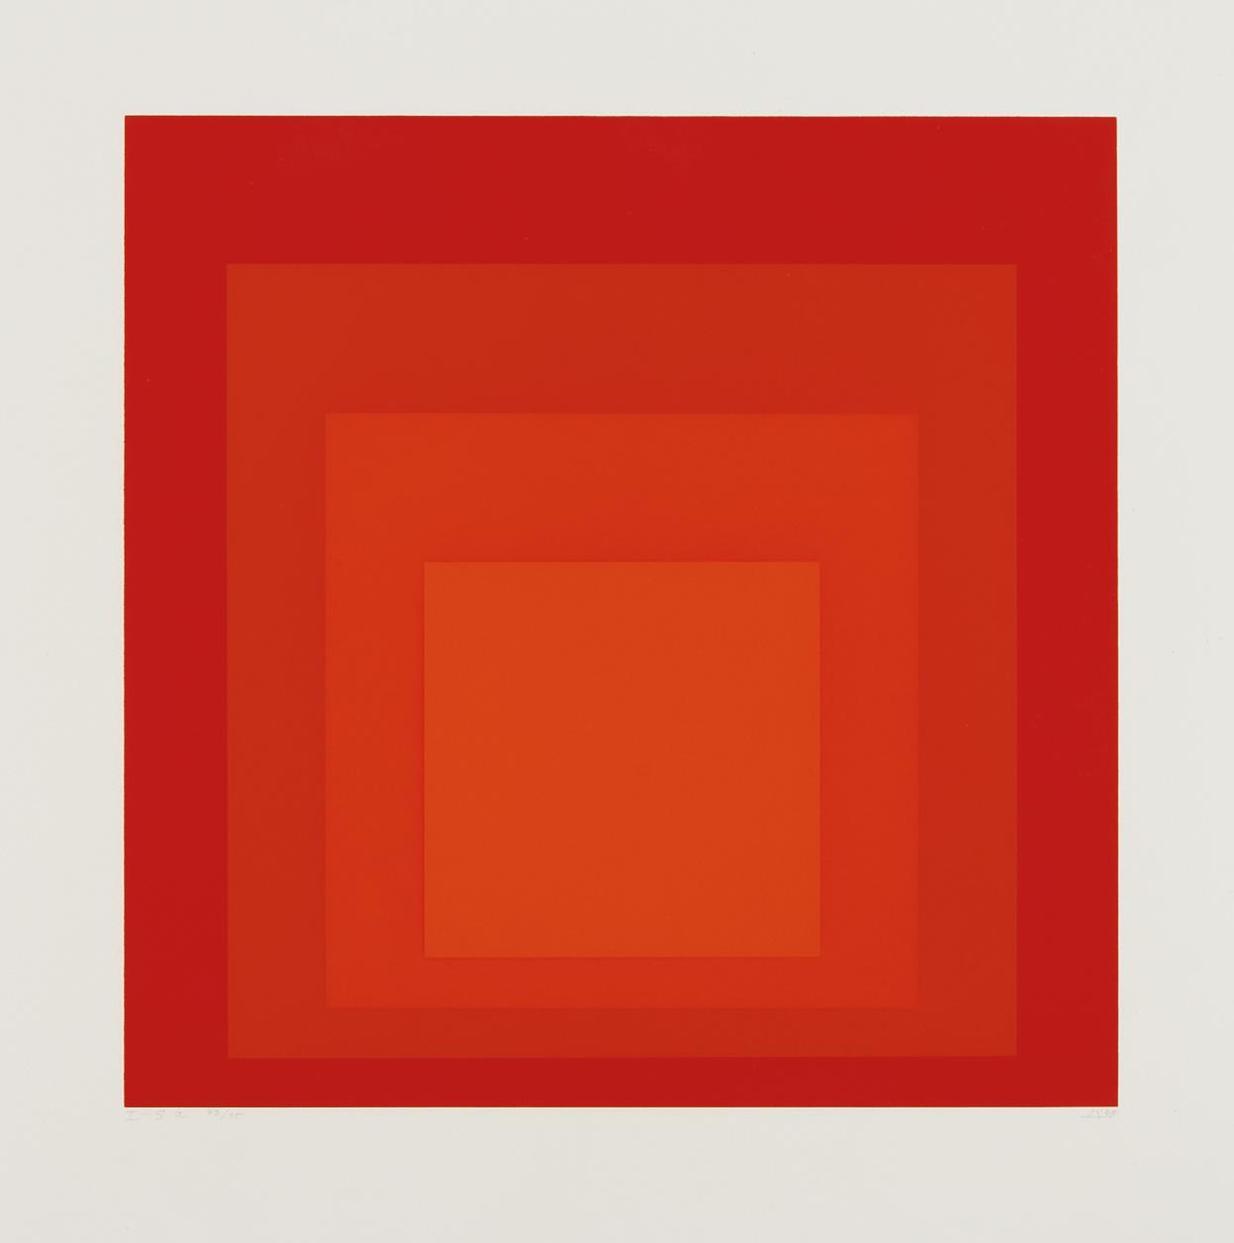 Josef Albers-I-S A-1968